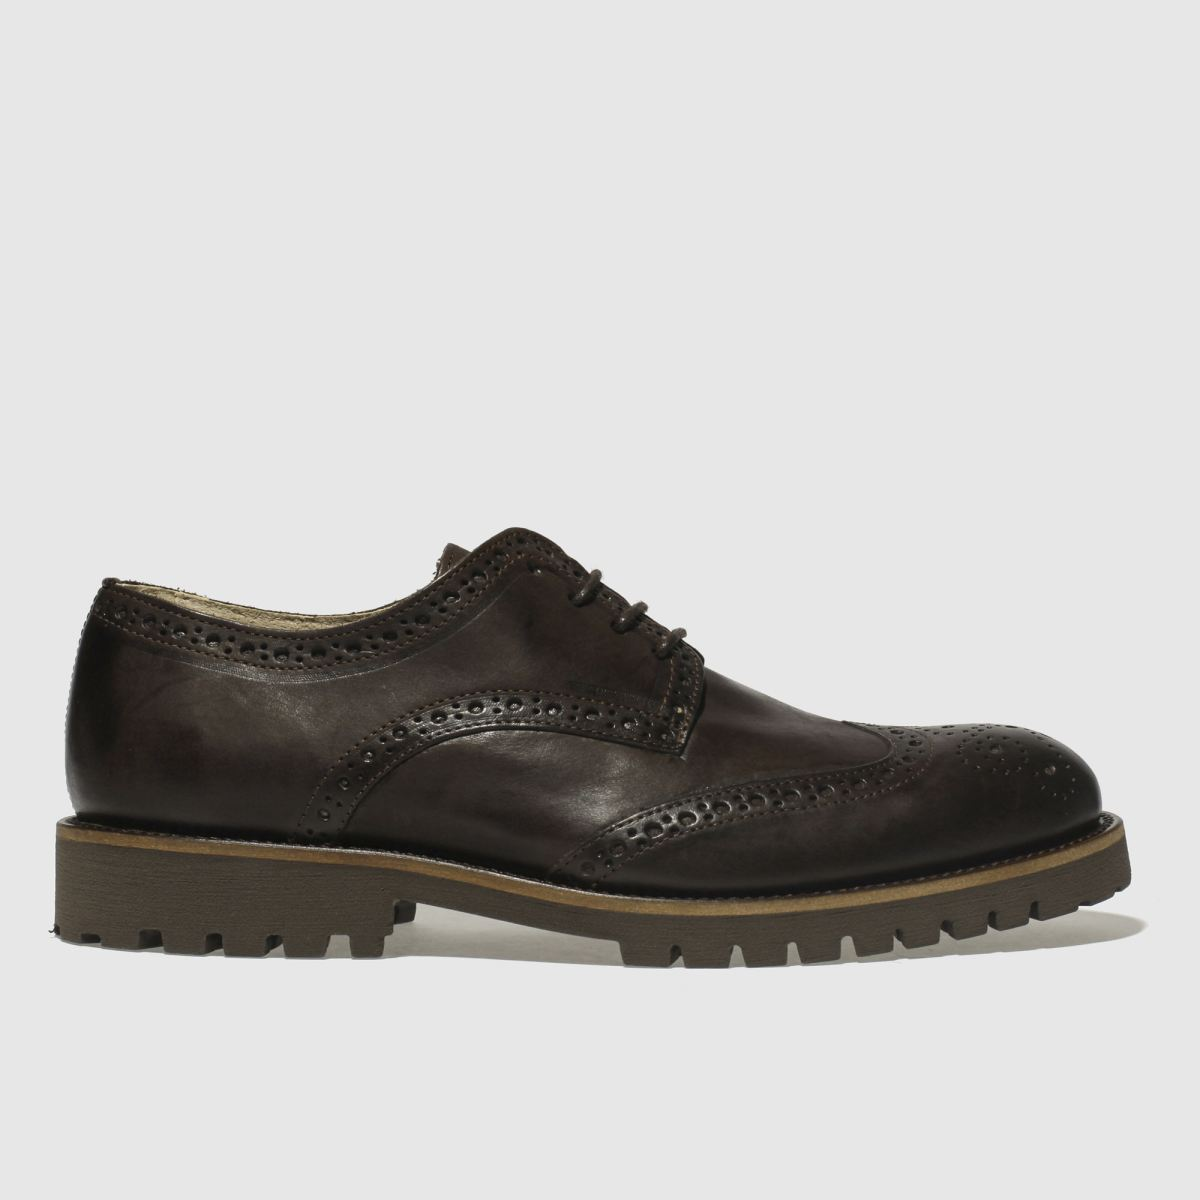 Schuh Dark Brown Bishop Shoes